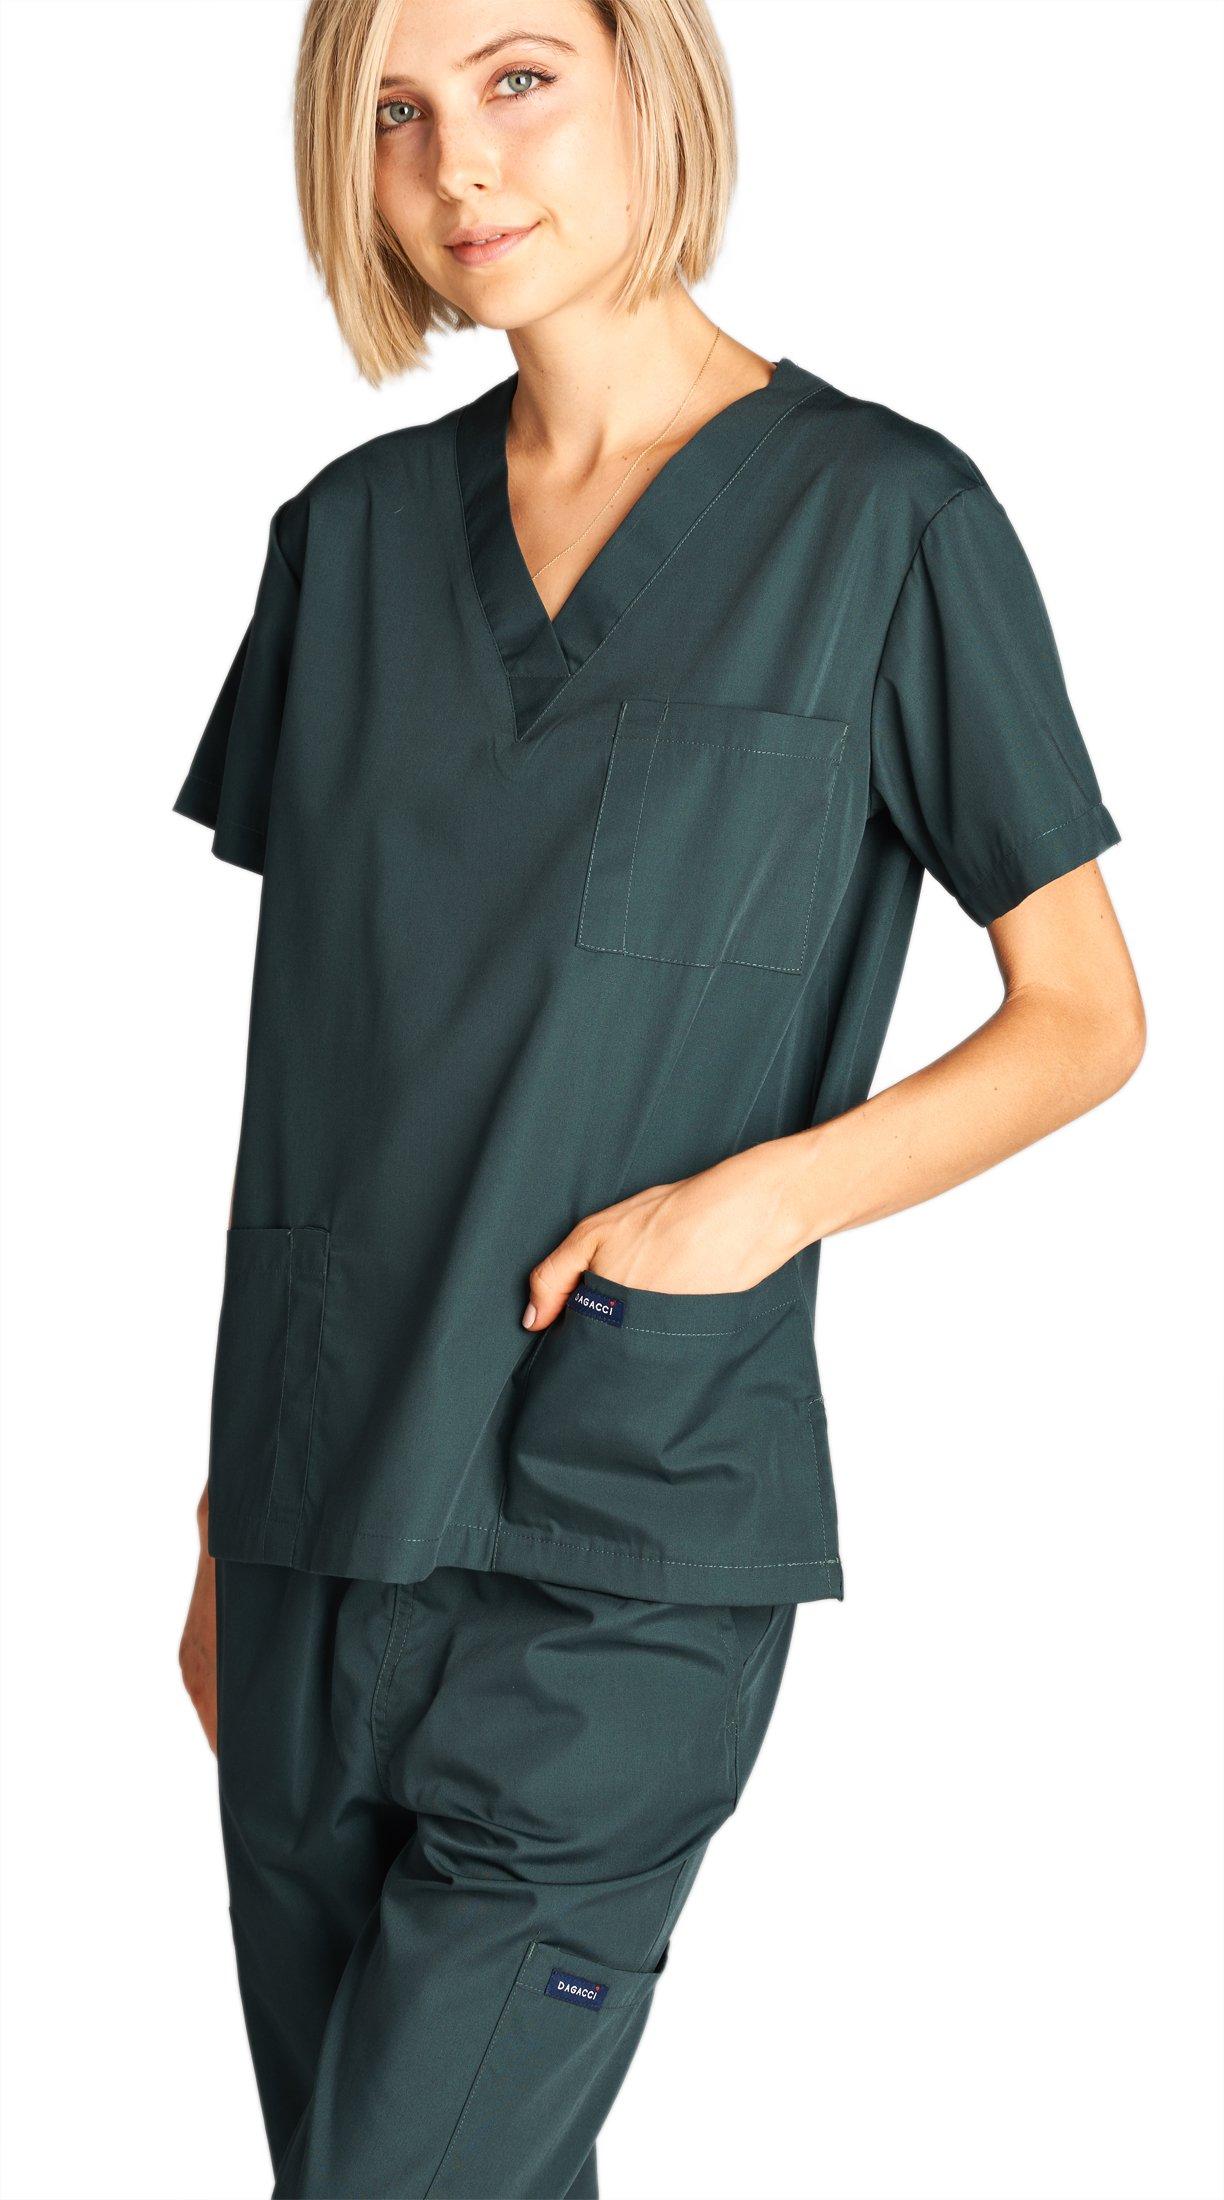 Dagacci Medical Uniform Woman and Man Scrub Set Unisex Medical Scrub Top and Pant, HGREEN, S by Dagacci Medical Uniform (Image #1)